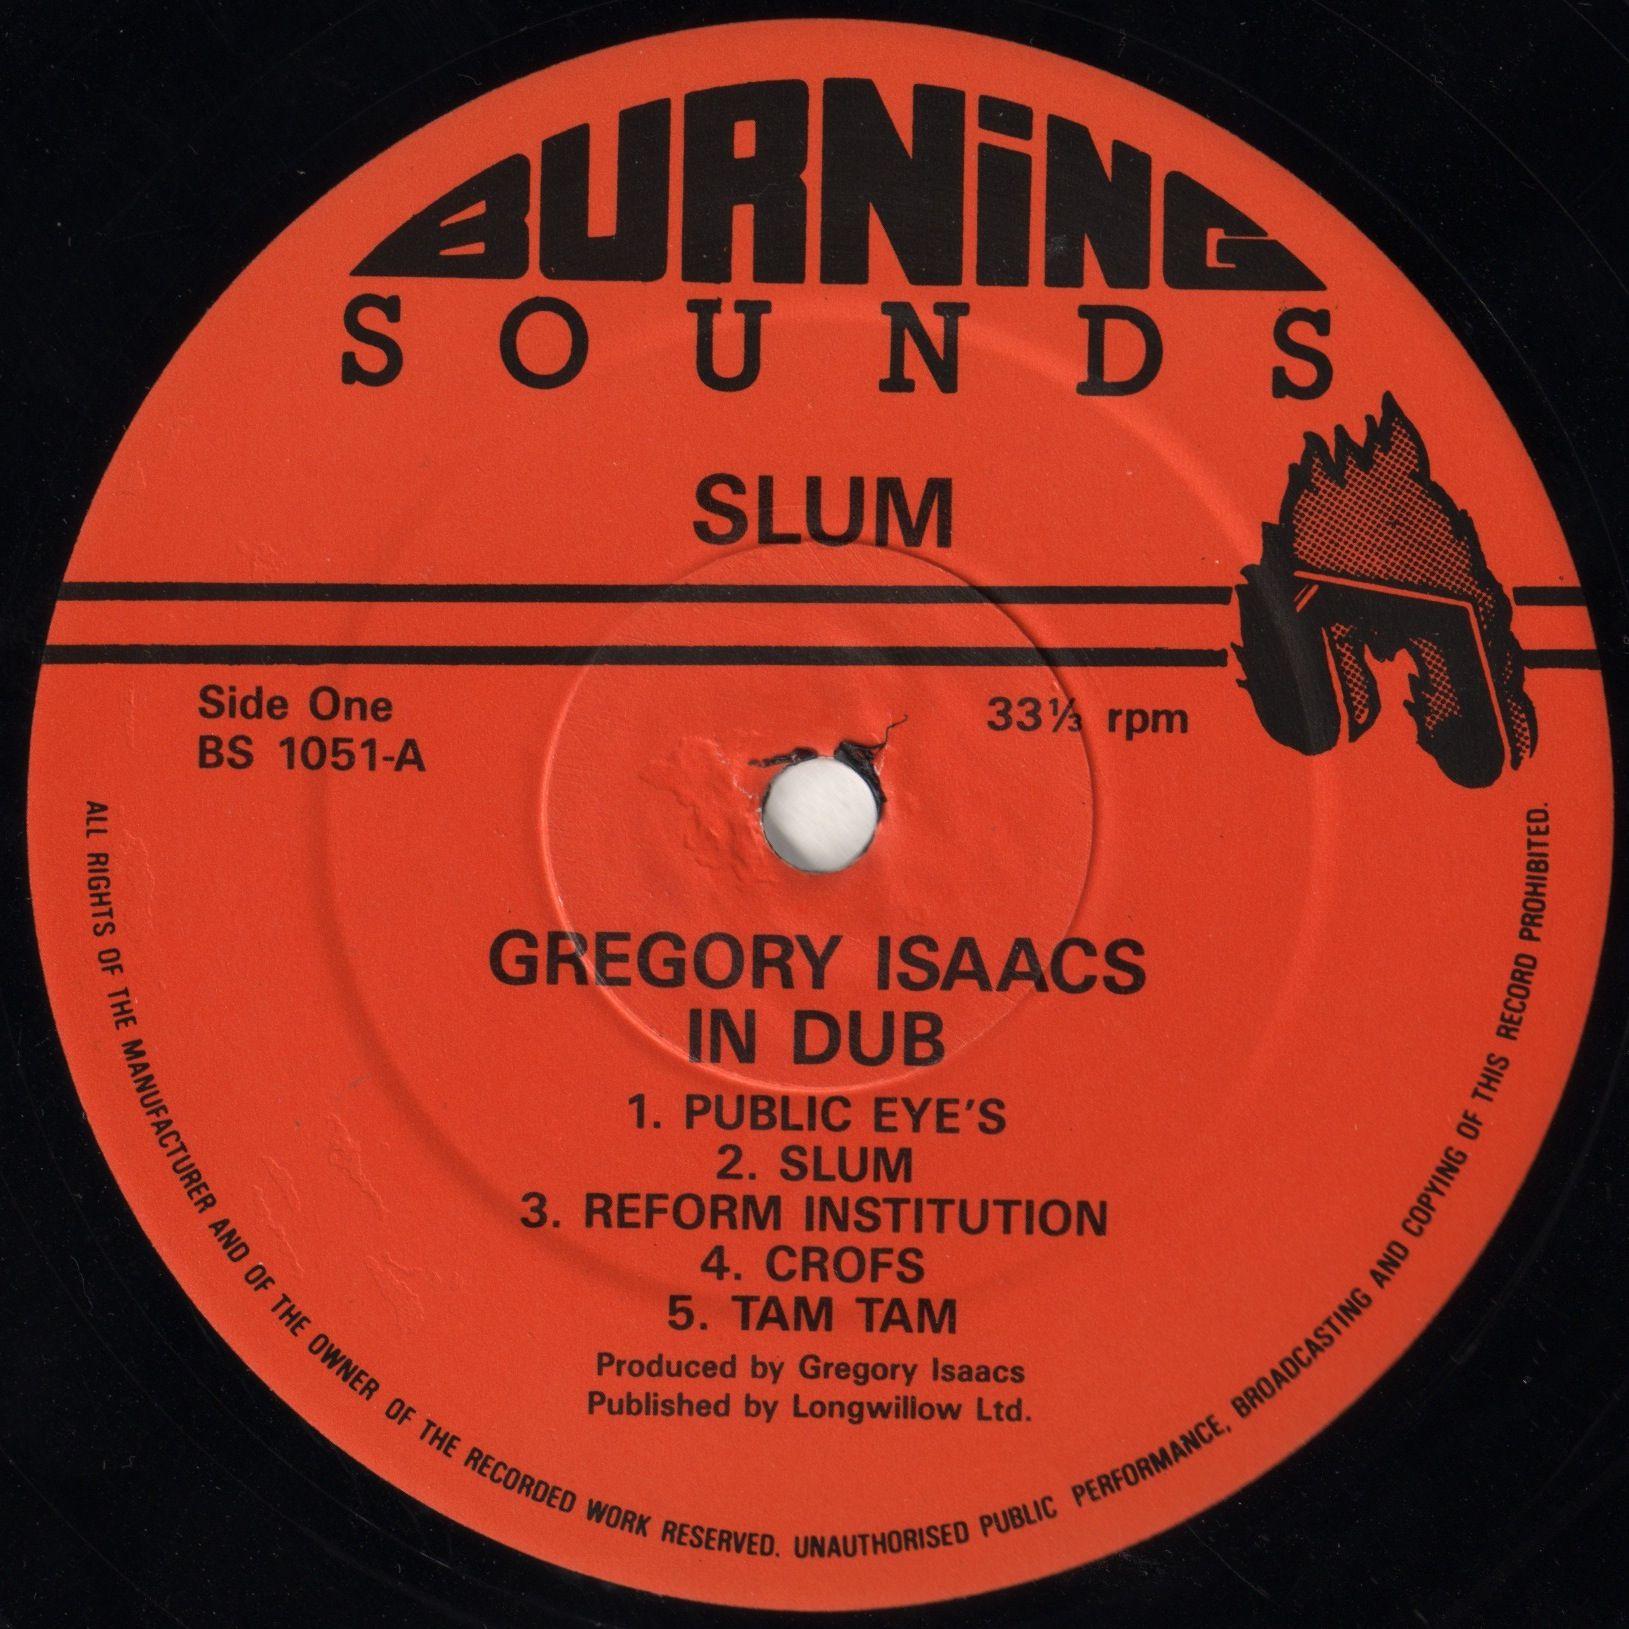 Gregory Isaacs - Slum In Dub (Label)